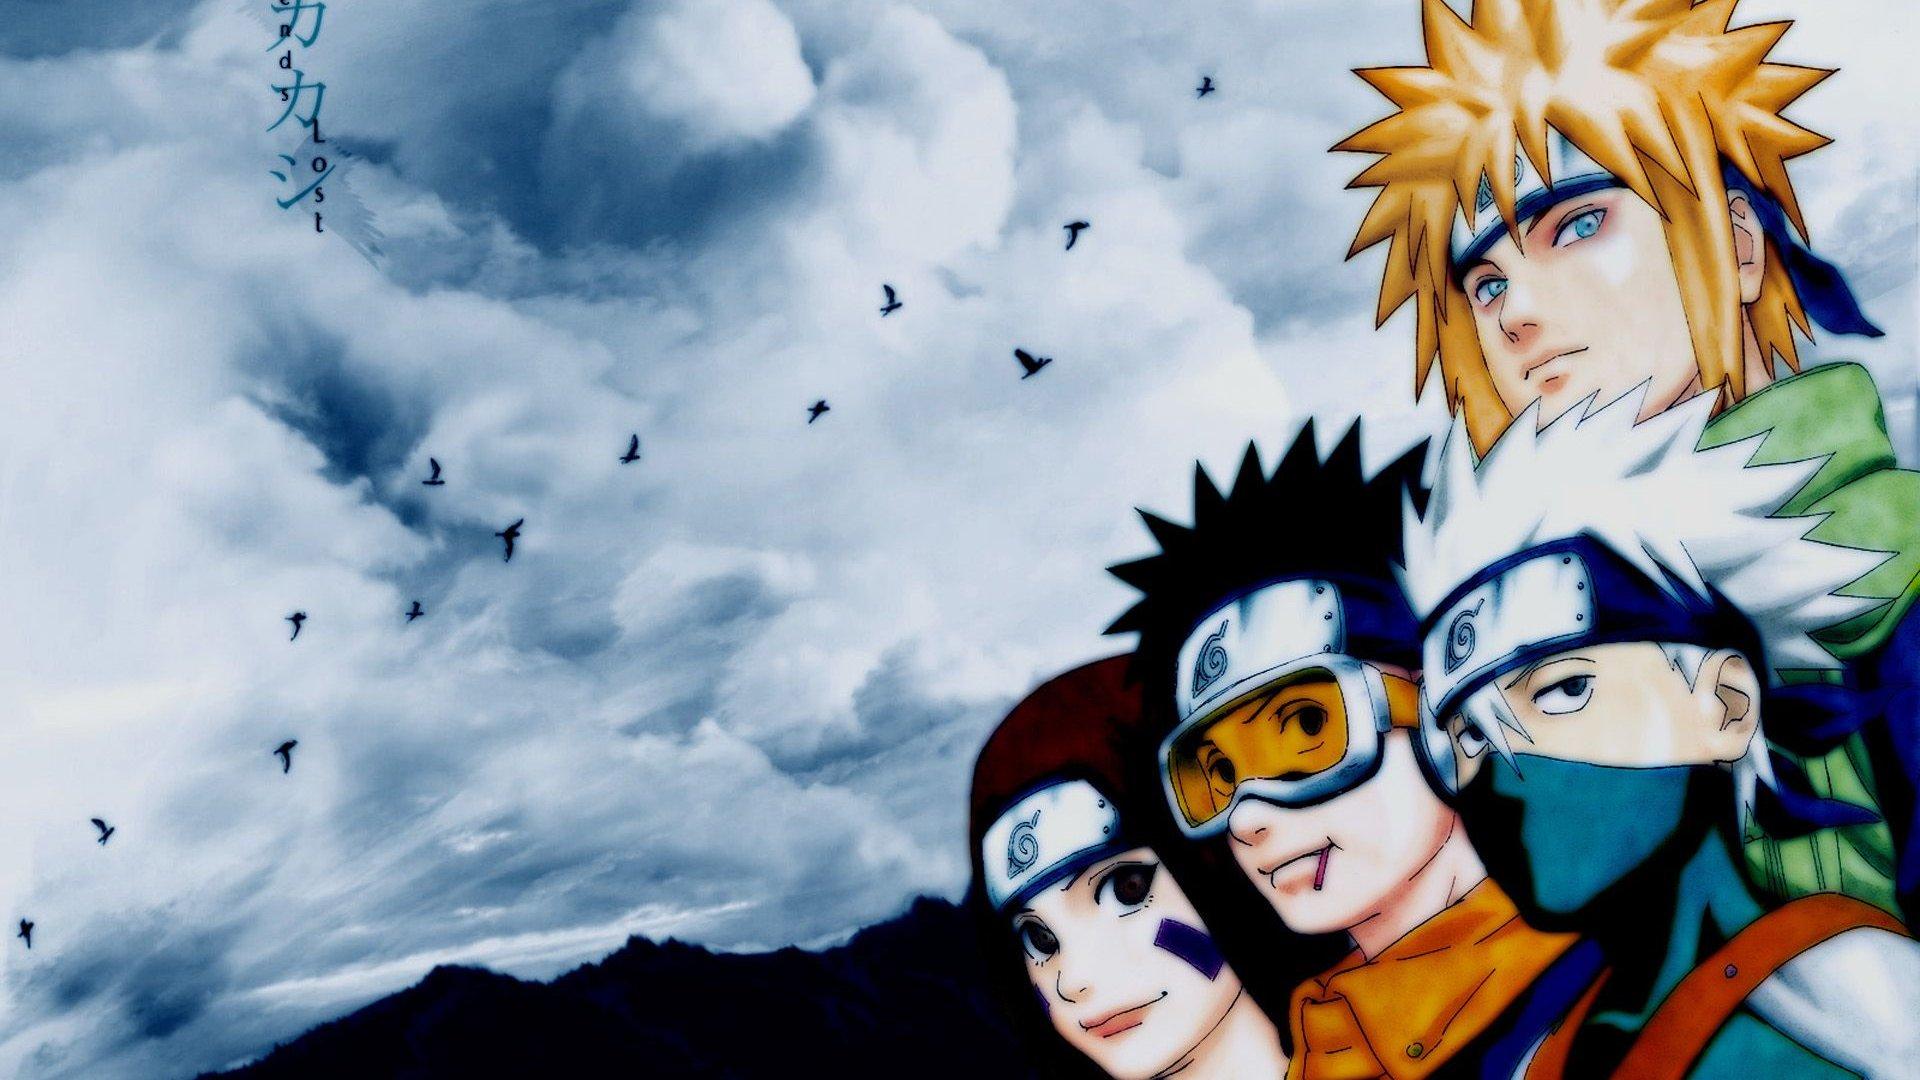 Hot anime Naruto HD Wallpapers 1920x1080 hd Animation wallpaper 1920x1080